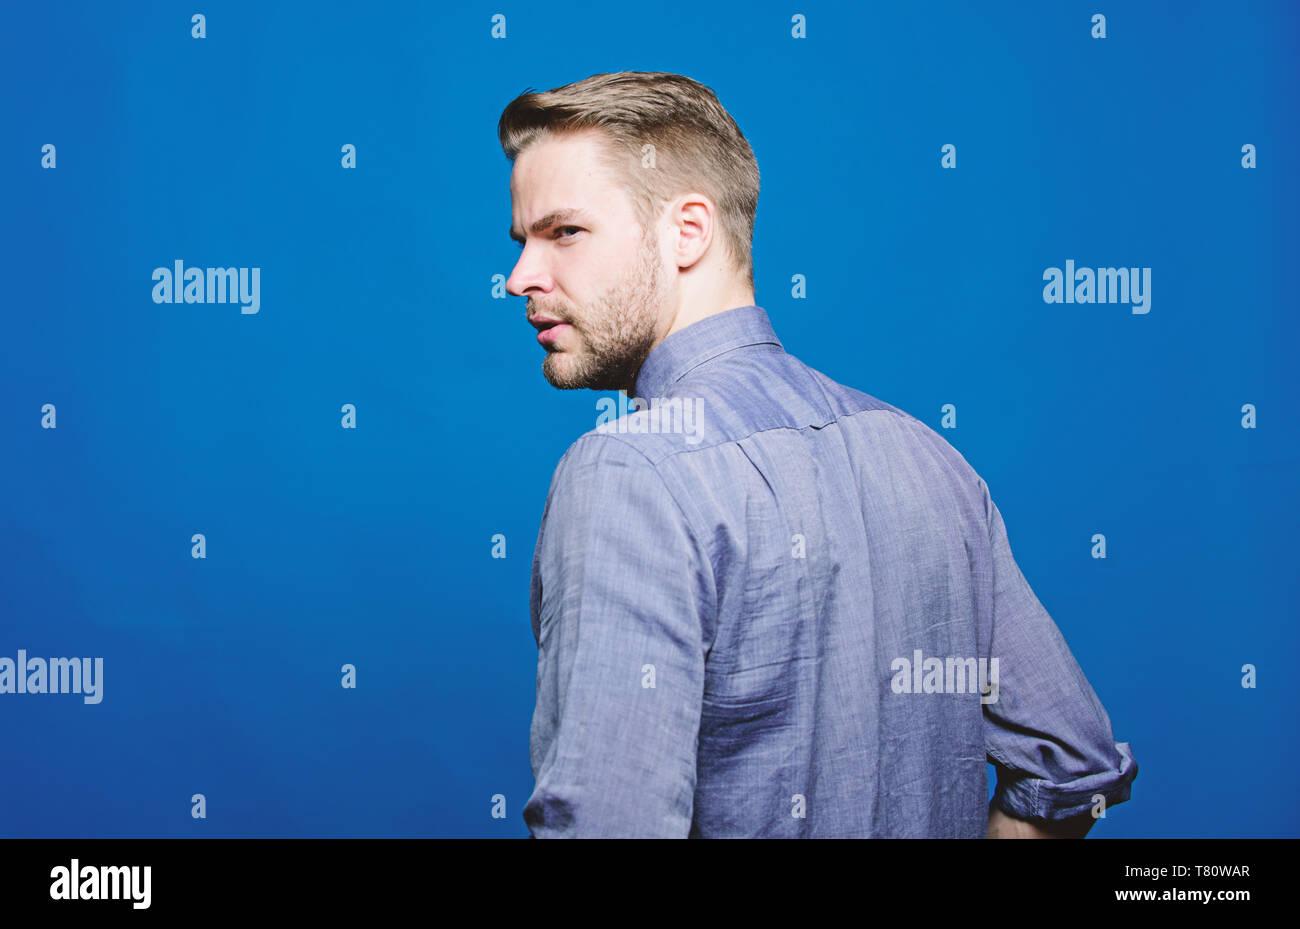 Barber and beard care. Beard grooming salon. Barber salon. Beard grooming. Get ready for date. Hipster denim shirt looks attractive blue background. Man well groomed beard. Well groomed macho. - Stock Image